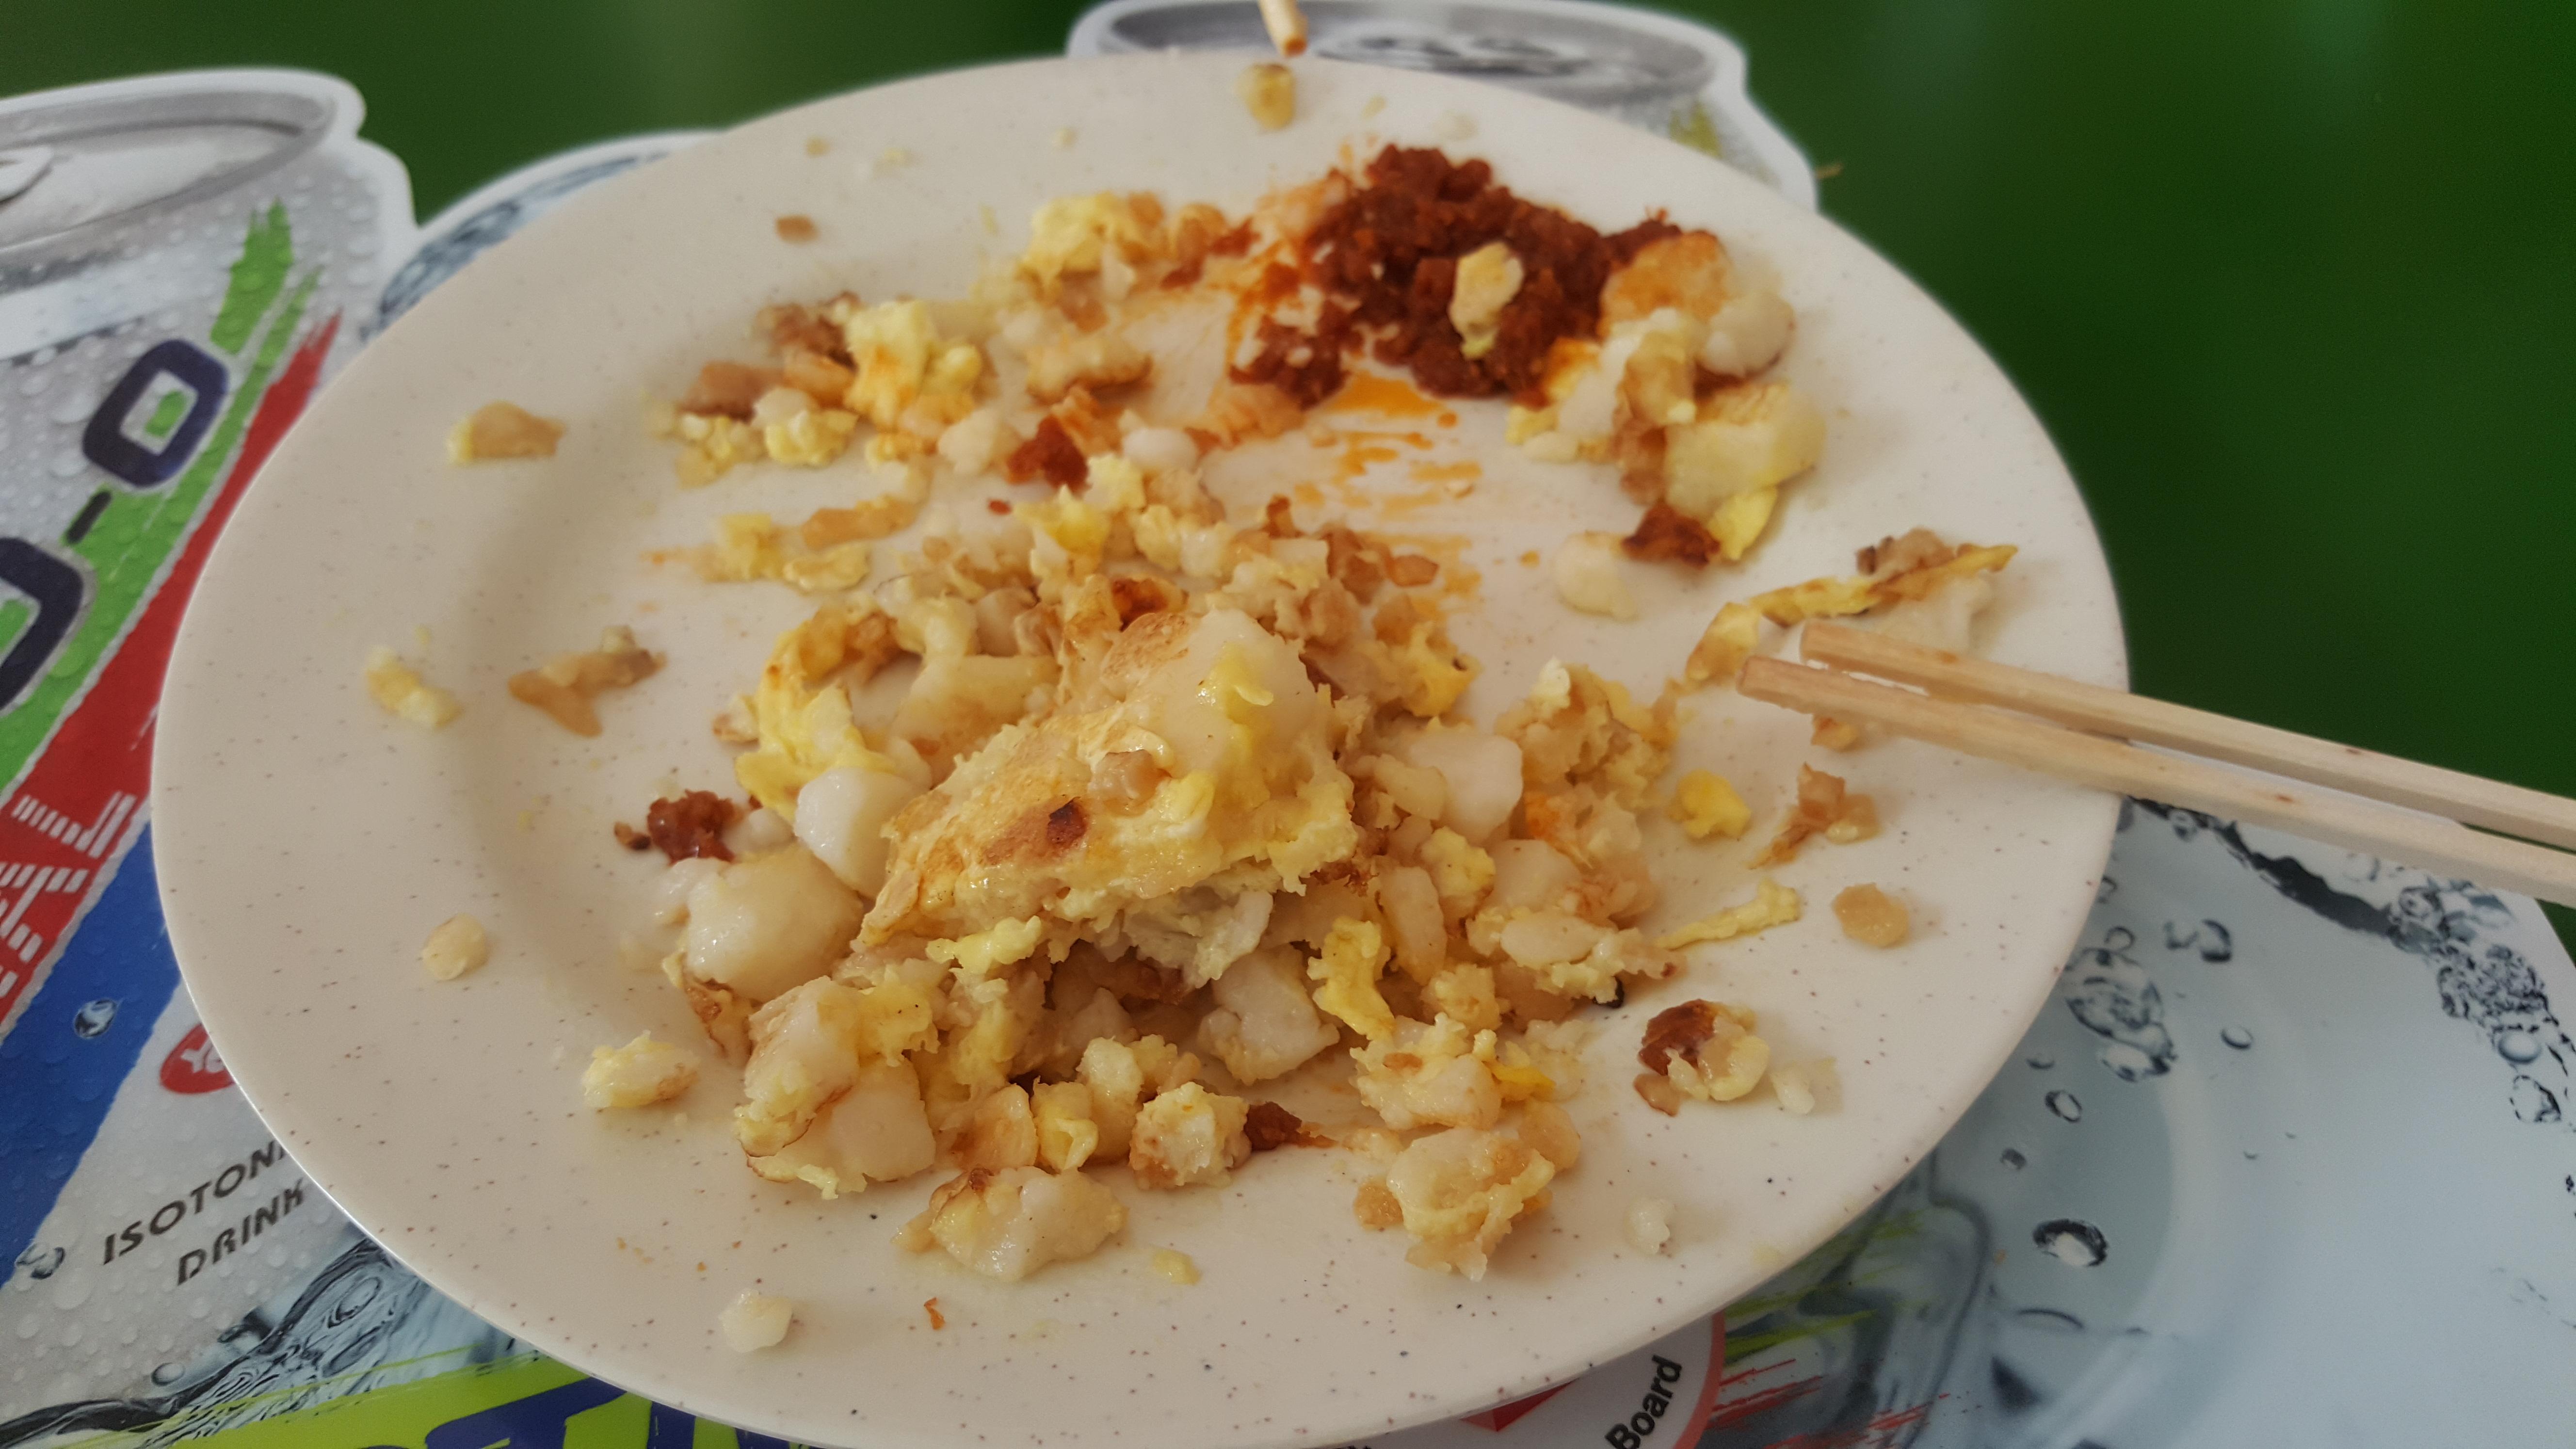 Singapore Food Staples Carrot Cake Surprising Horizons